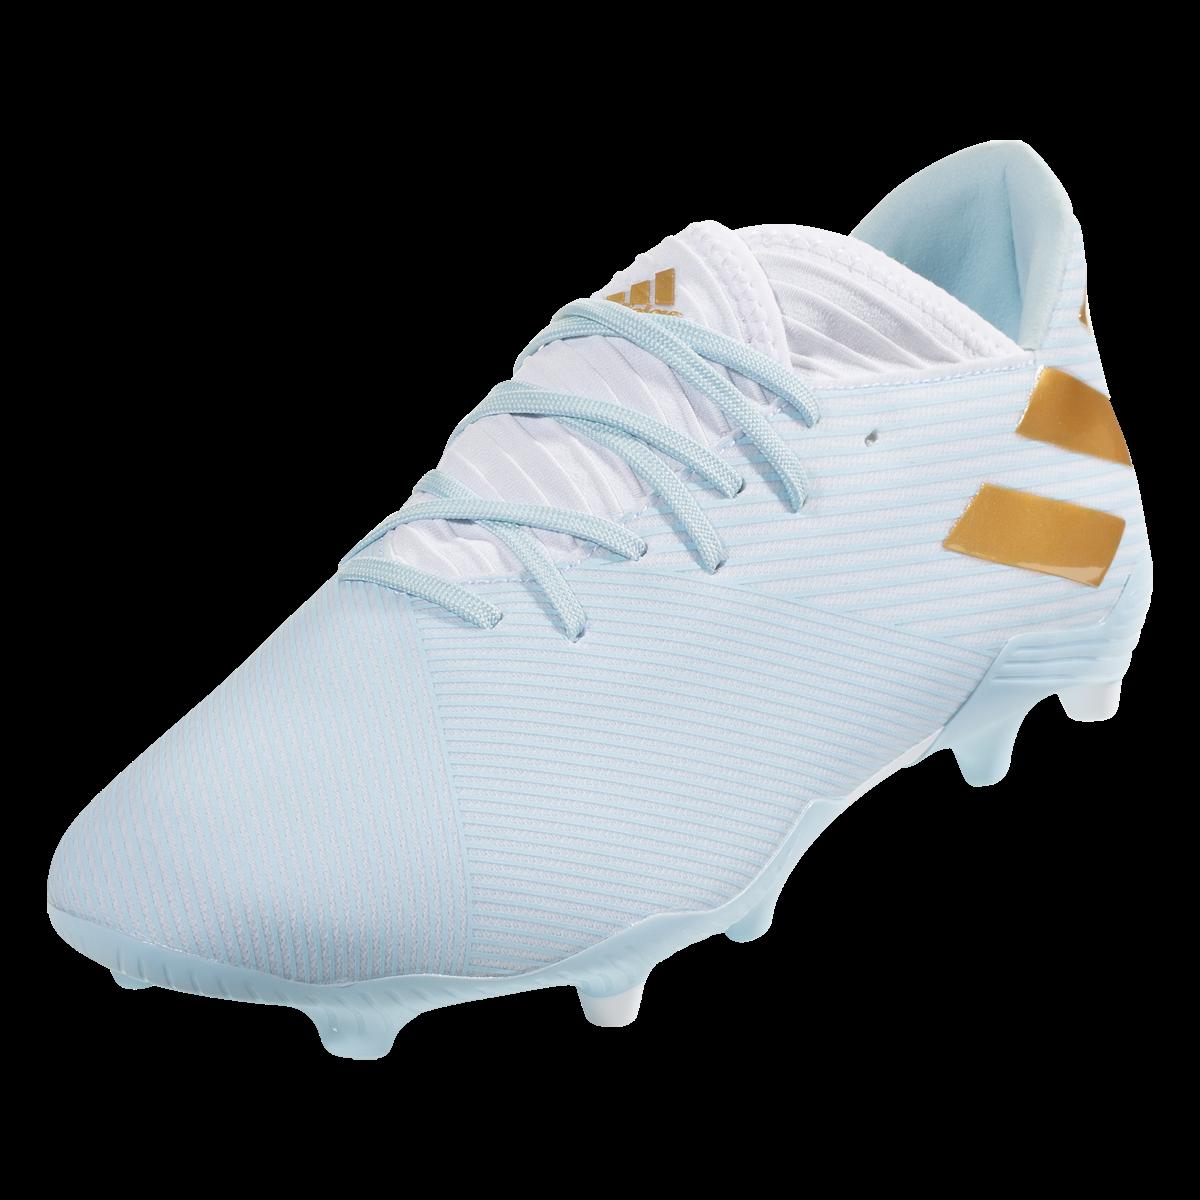 Custom soccer cleats